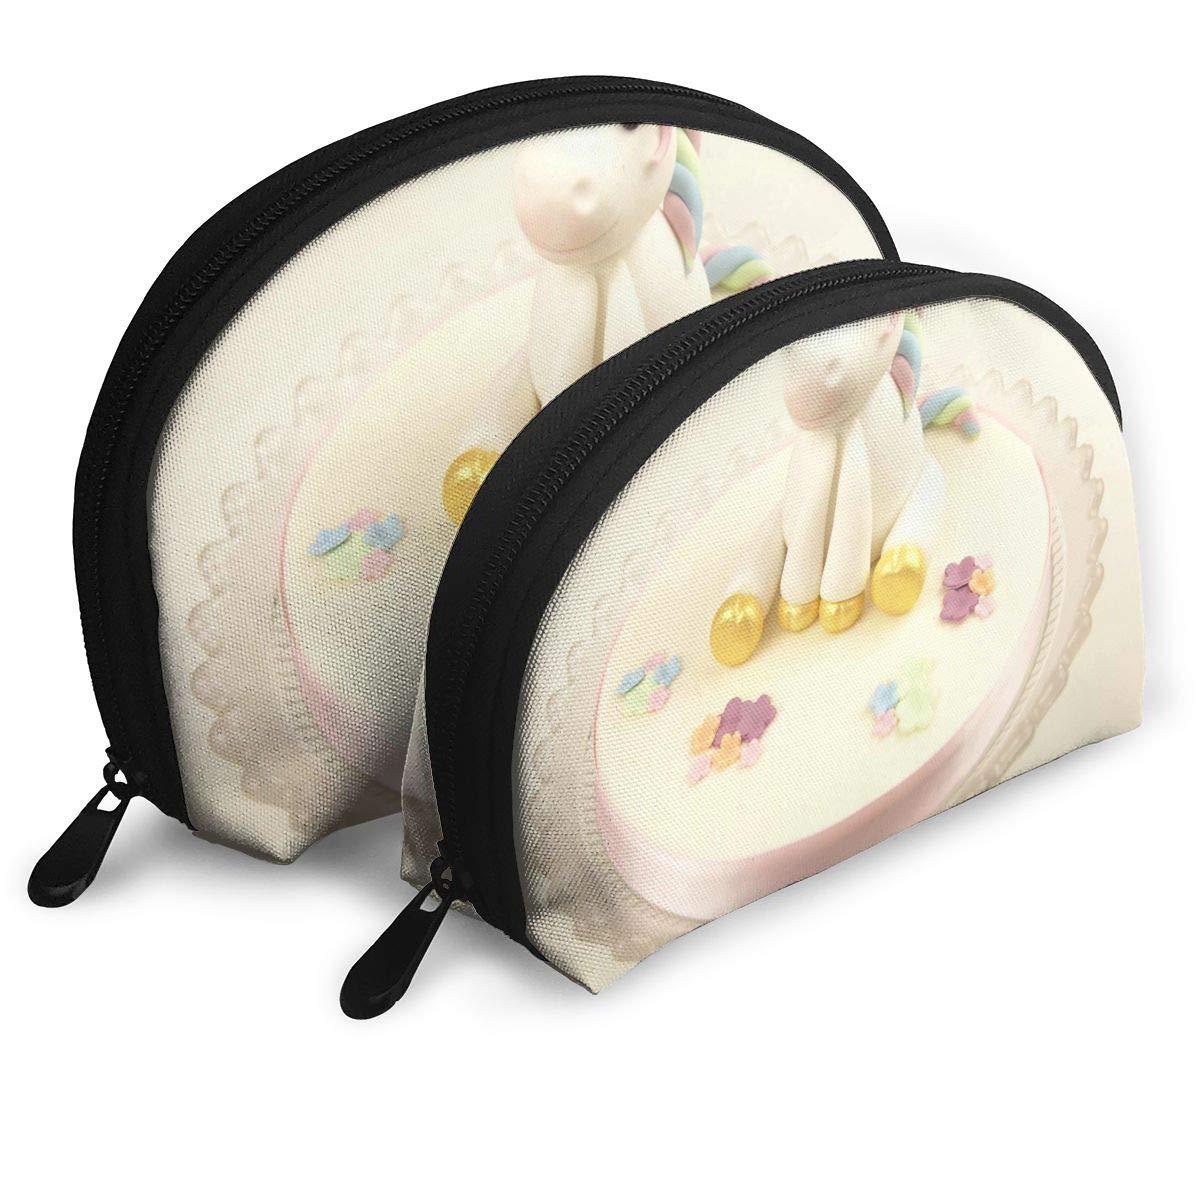 Toiletry Organizer Travel Makeup Clutch Bag Rainbow Unicorn Model Guide Portable Pouch Storage Bags